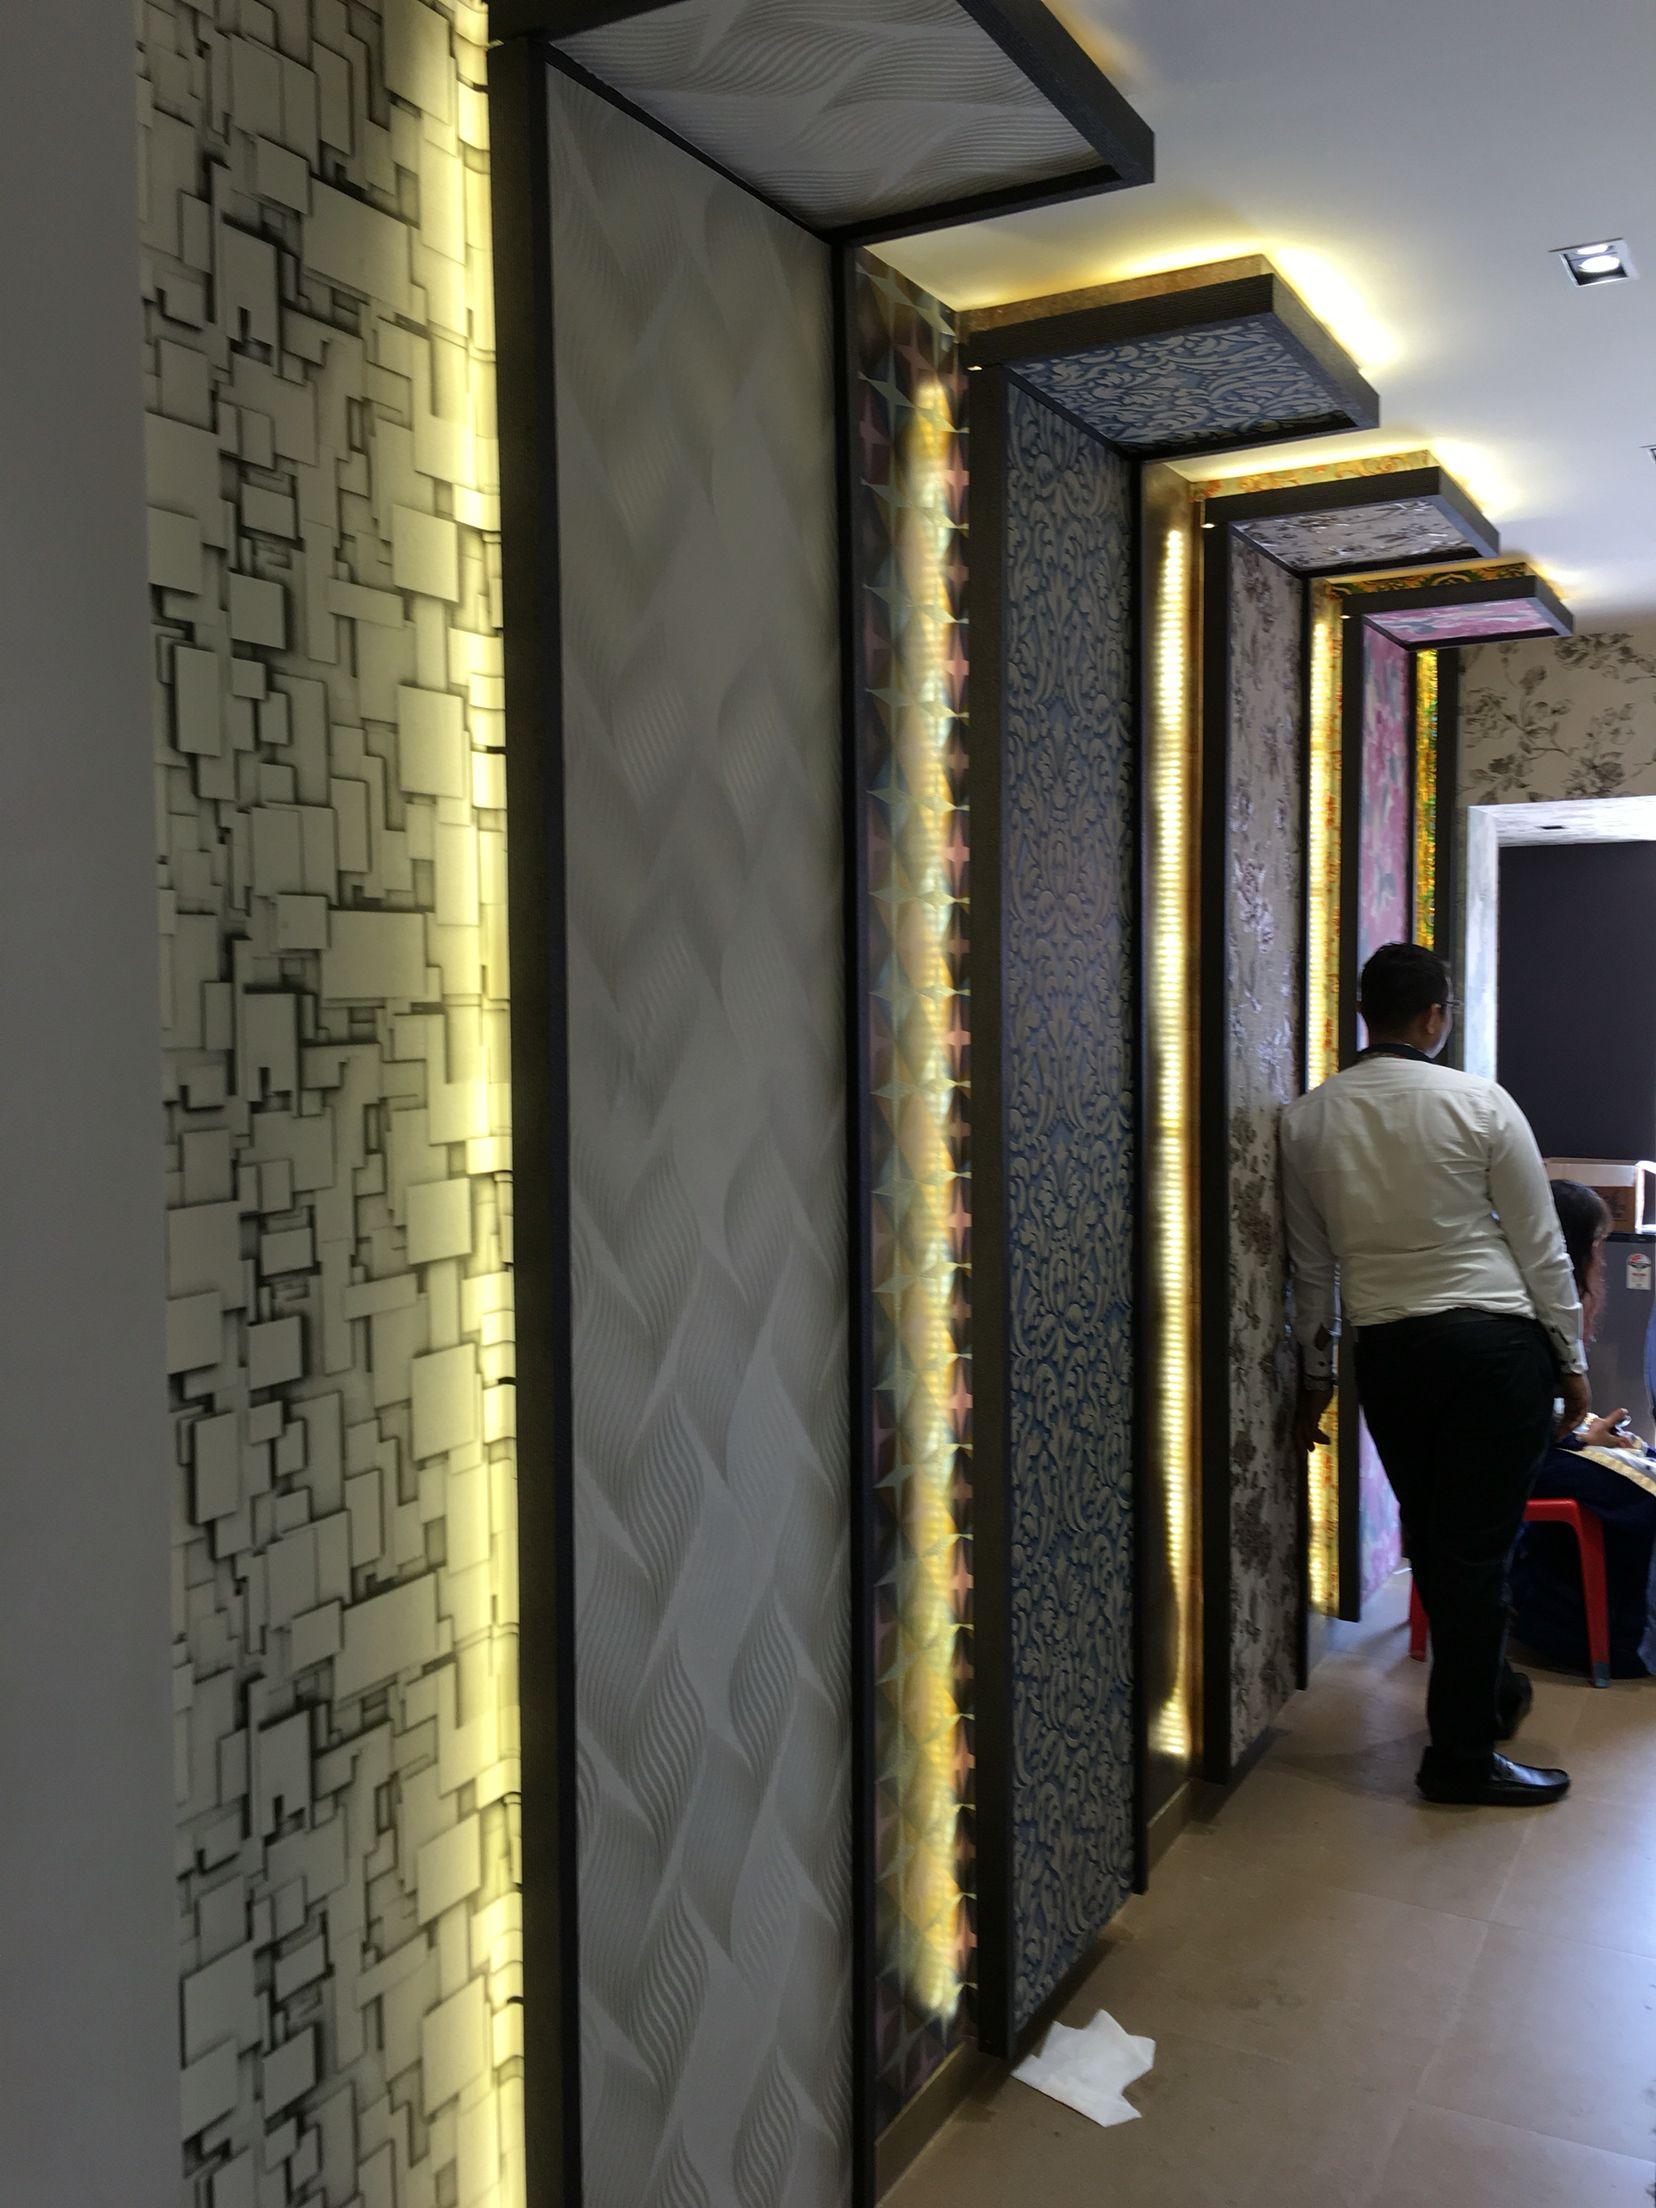 Wallpaper Display Panel Showroom Walldisplay Wallpaper Display Showroom Decor Wall Decor Design